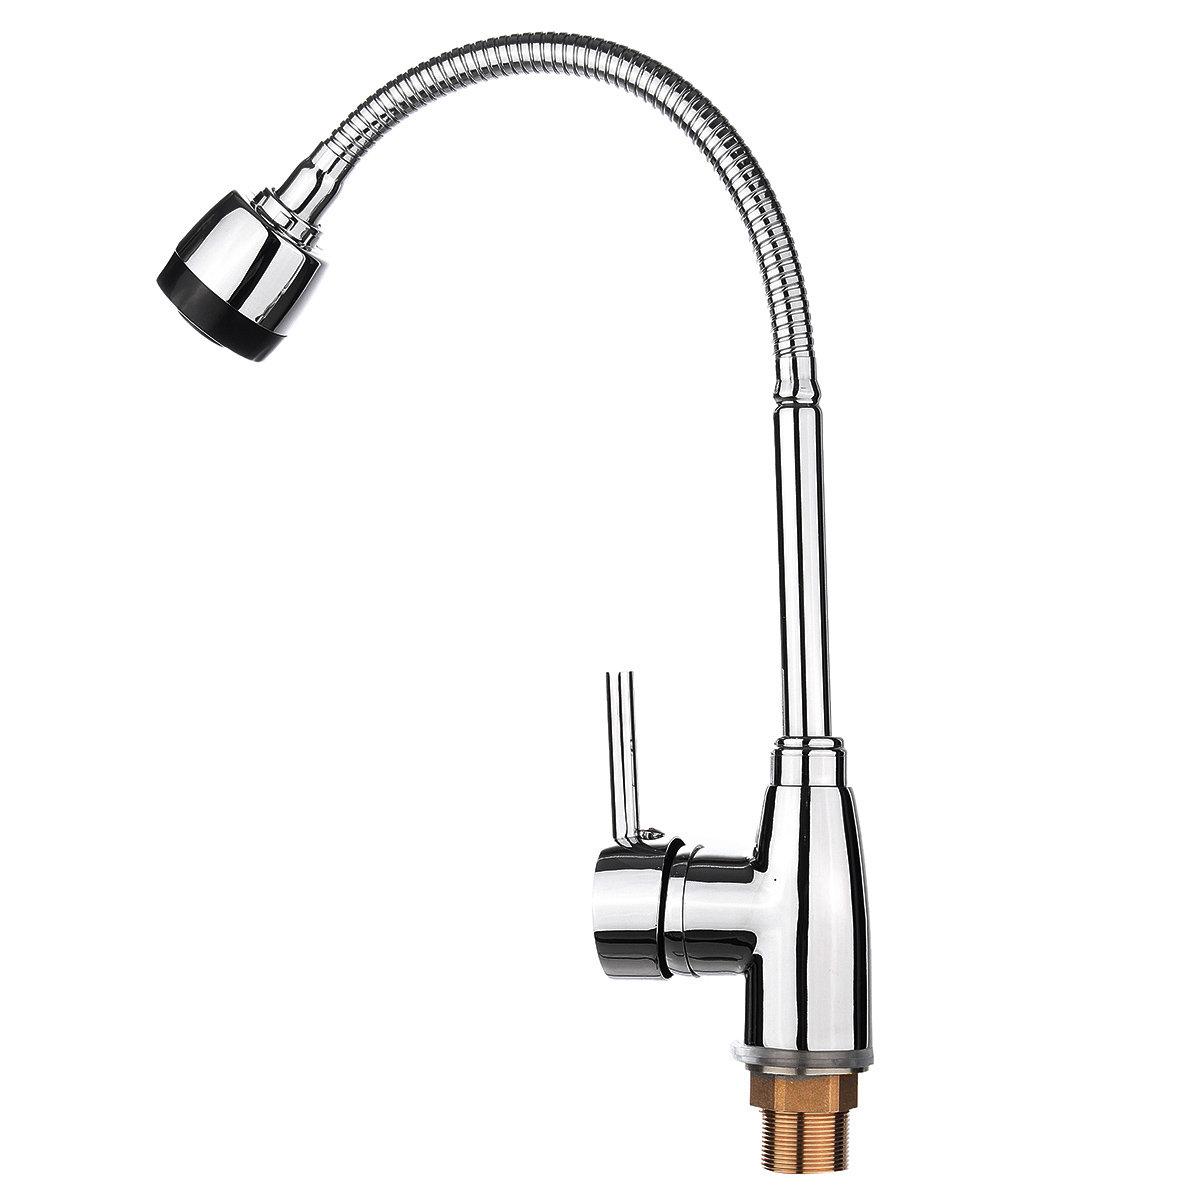 Kitchen 360° Swivel Spout Single Handle Sink Faucet Pull Down Spray Mixer Tap